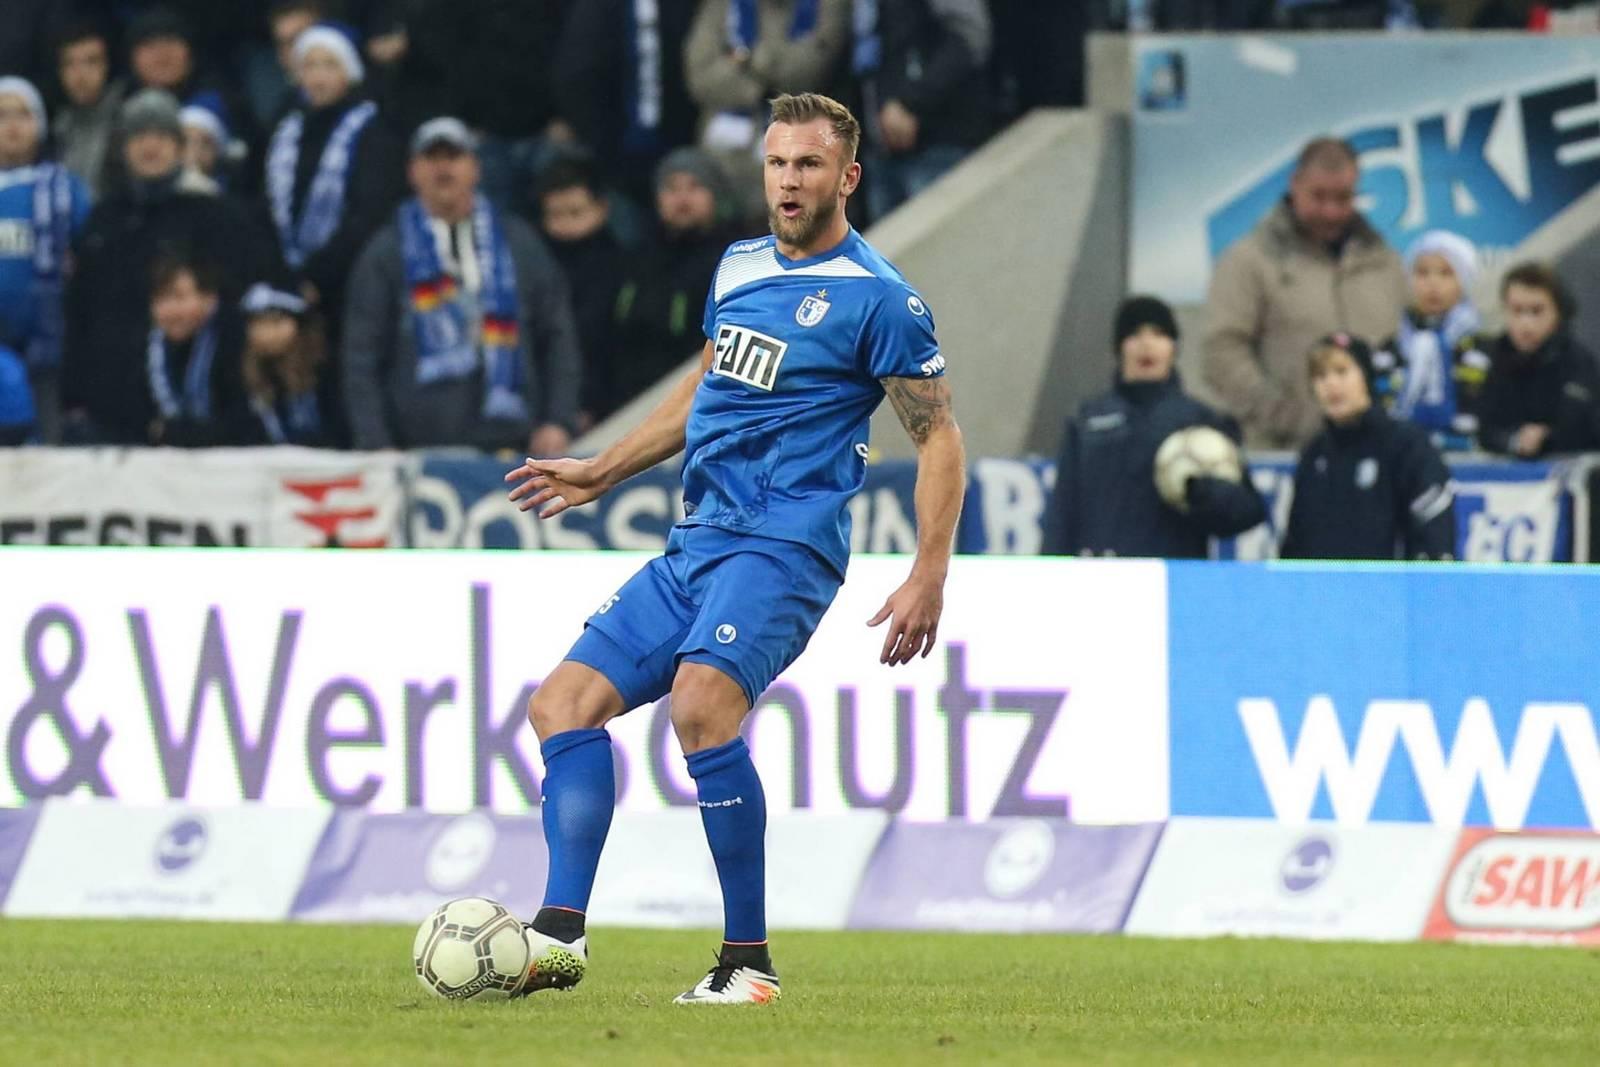 Felix Schiller im Trikot des 1. FC Magdeburg